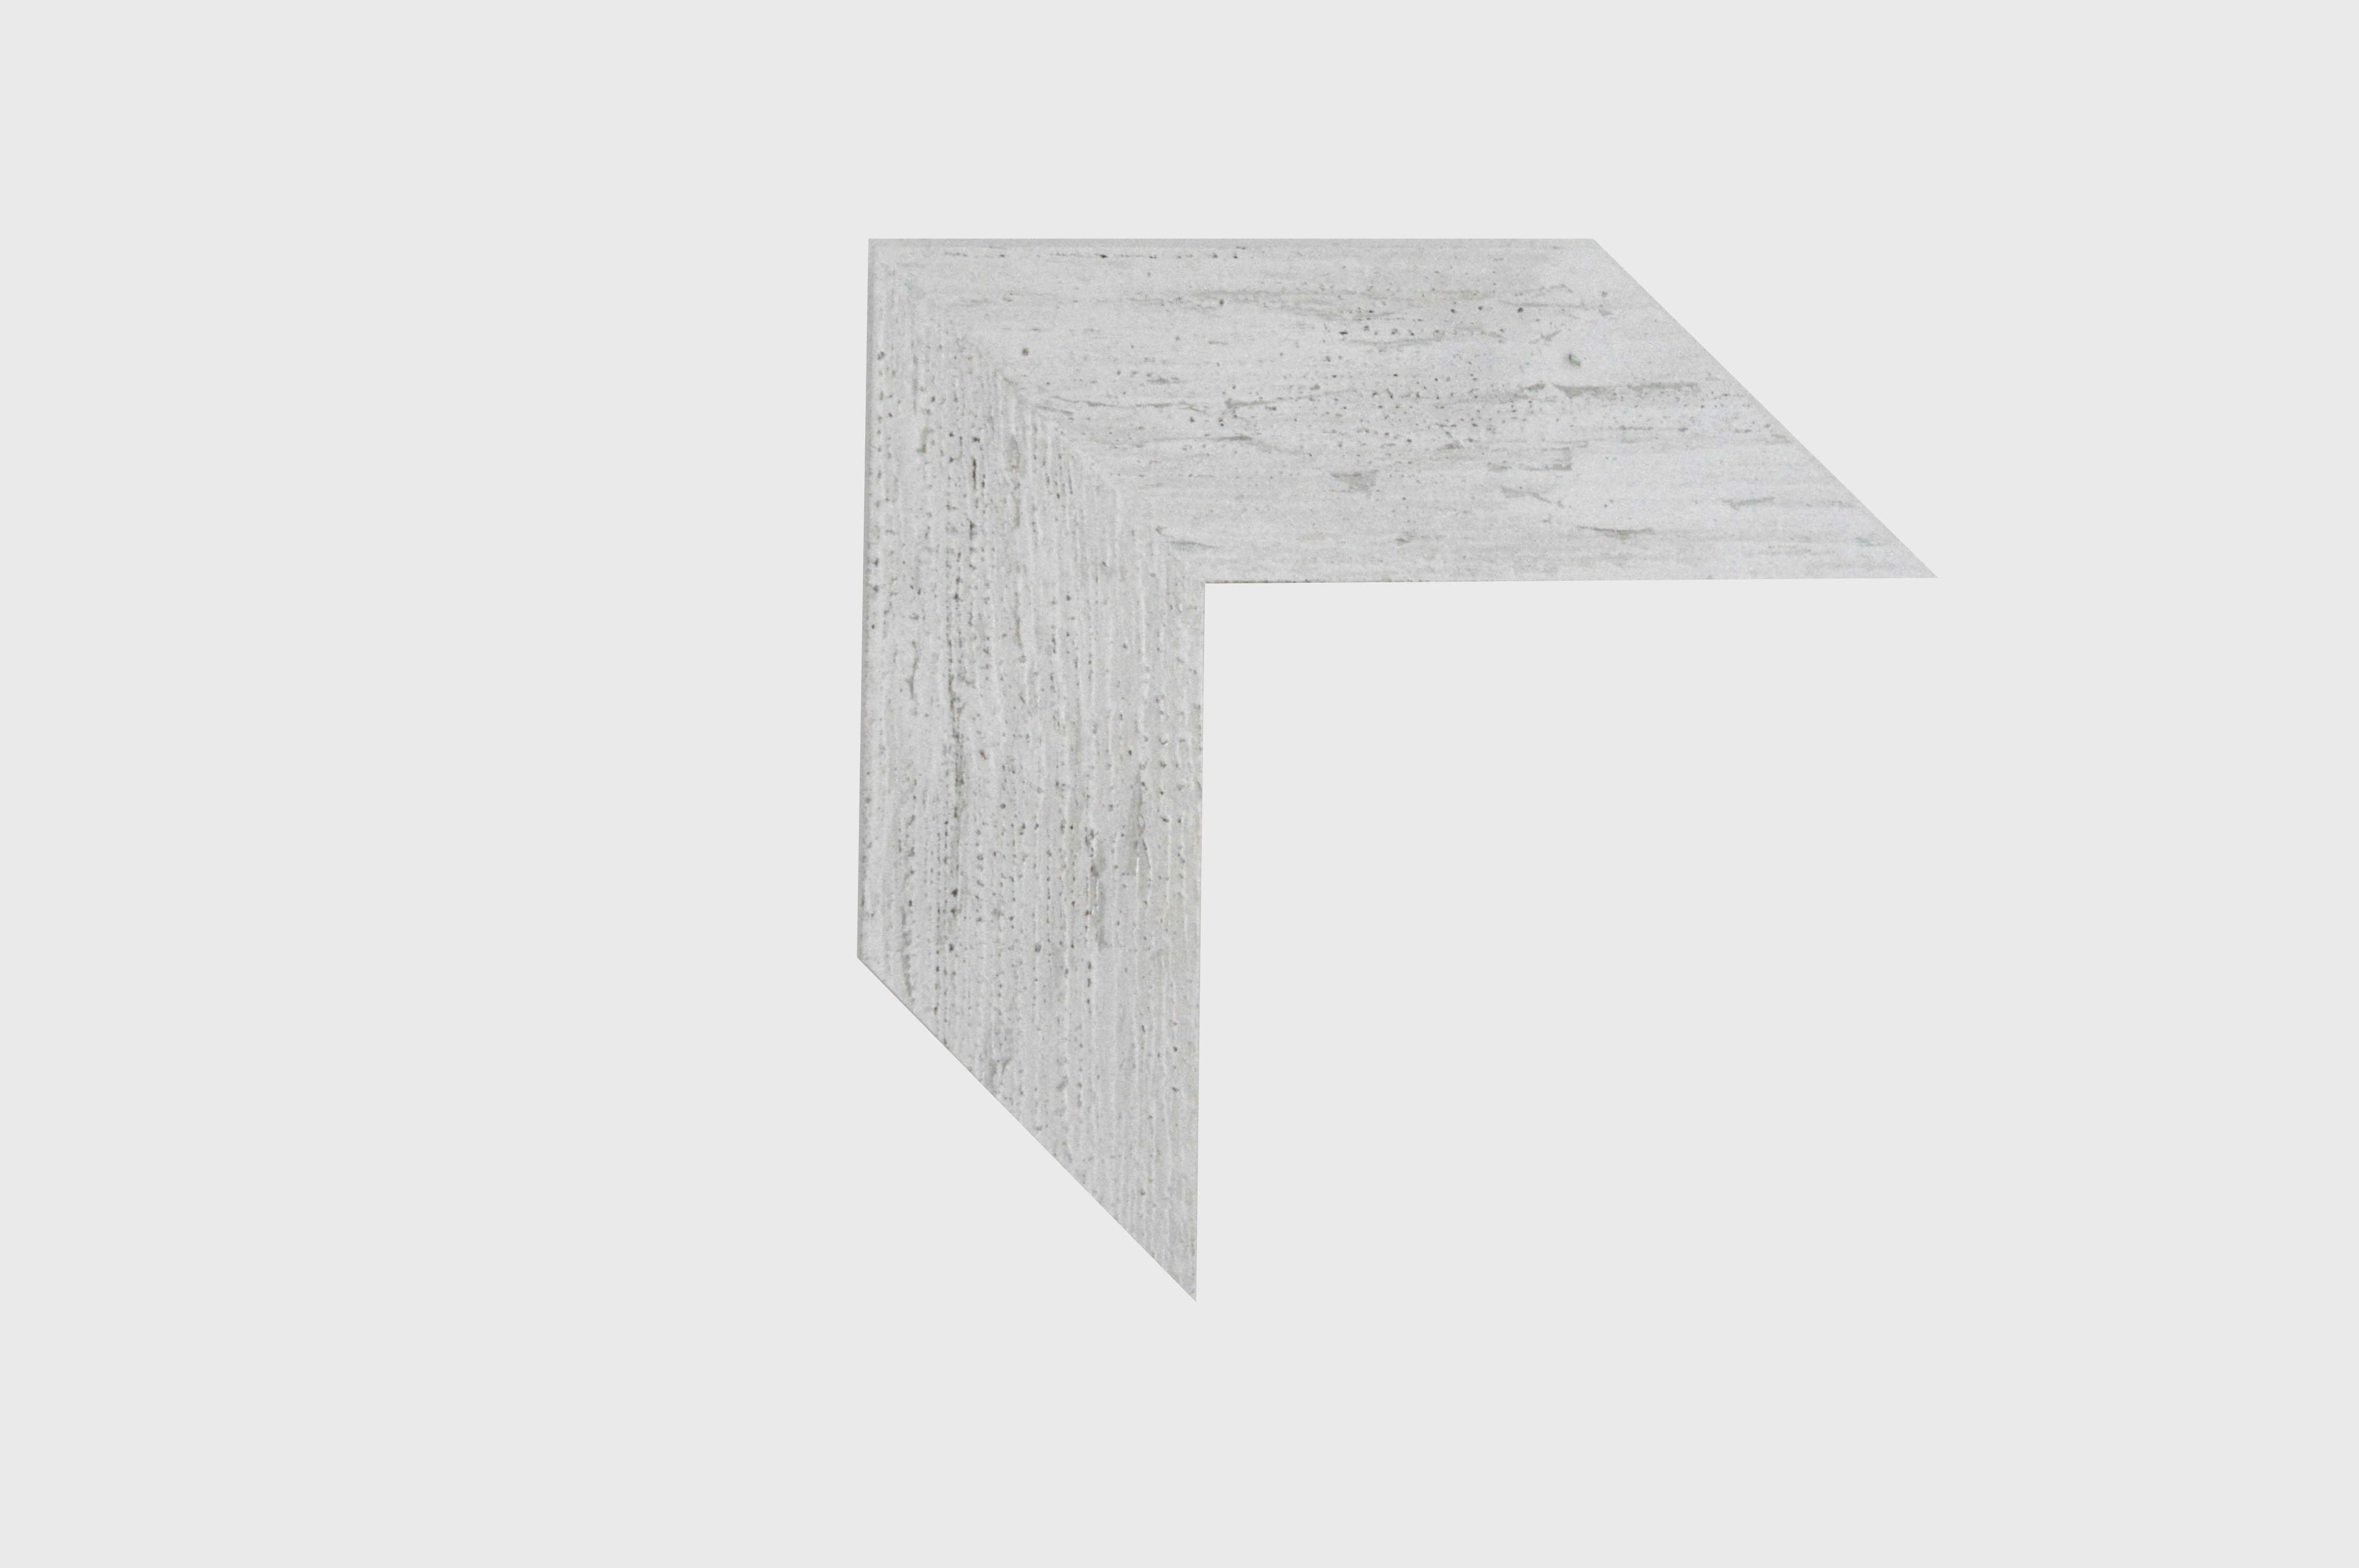 00899-110-BLANCA-ancho7cm